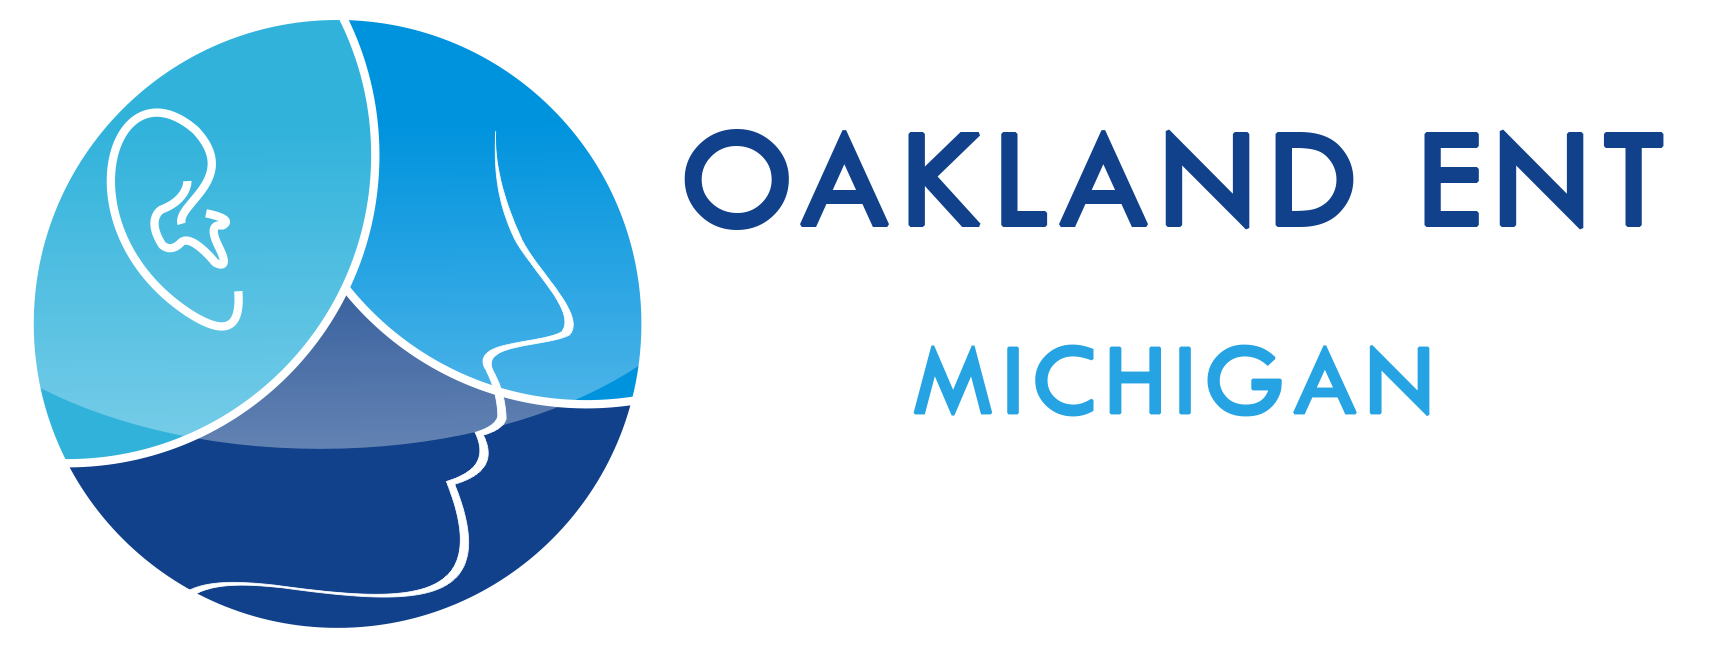 Oakland ENT